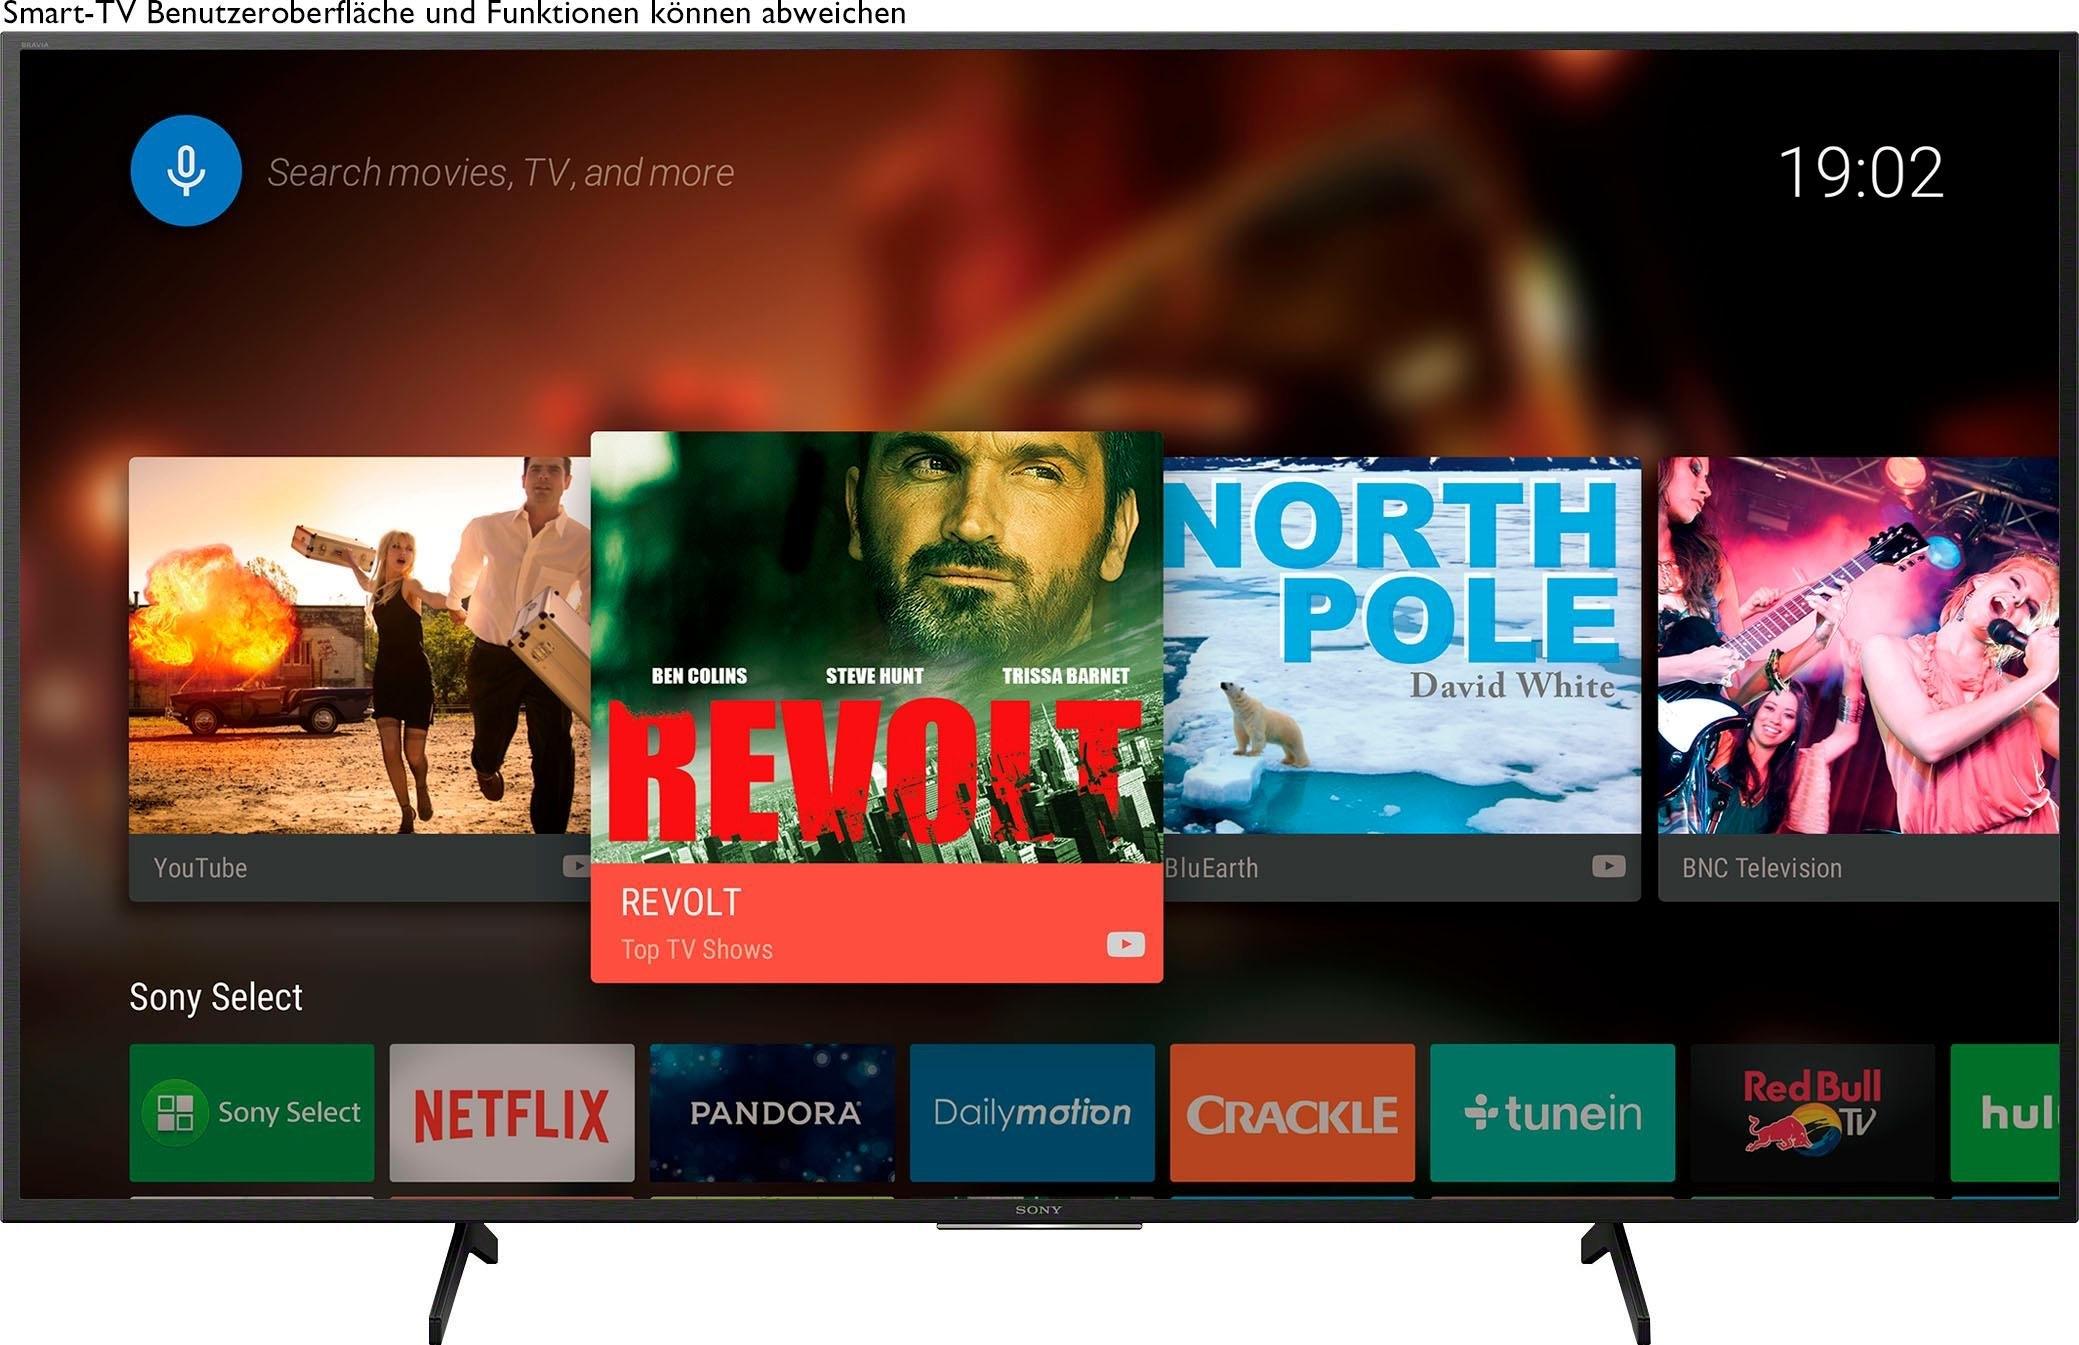 SONY KD55X7055 Bravia LED-televisie (139 cm / (55 Inch), 4K Ultra HD, Smart-TV veilig op otto.nl kopen